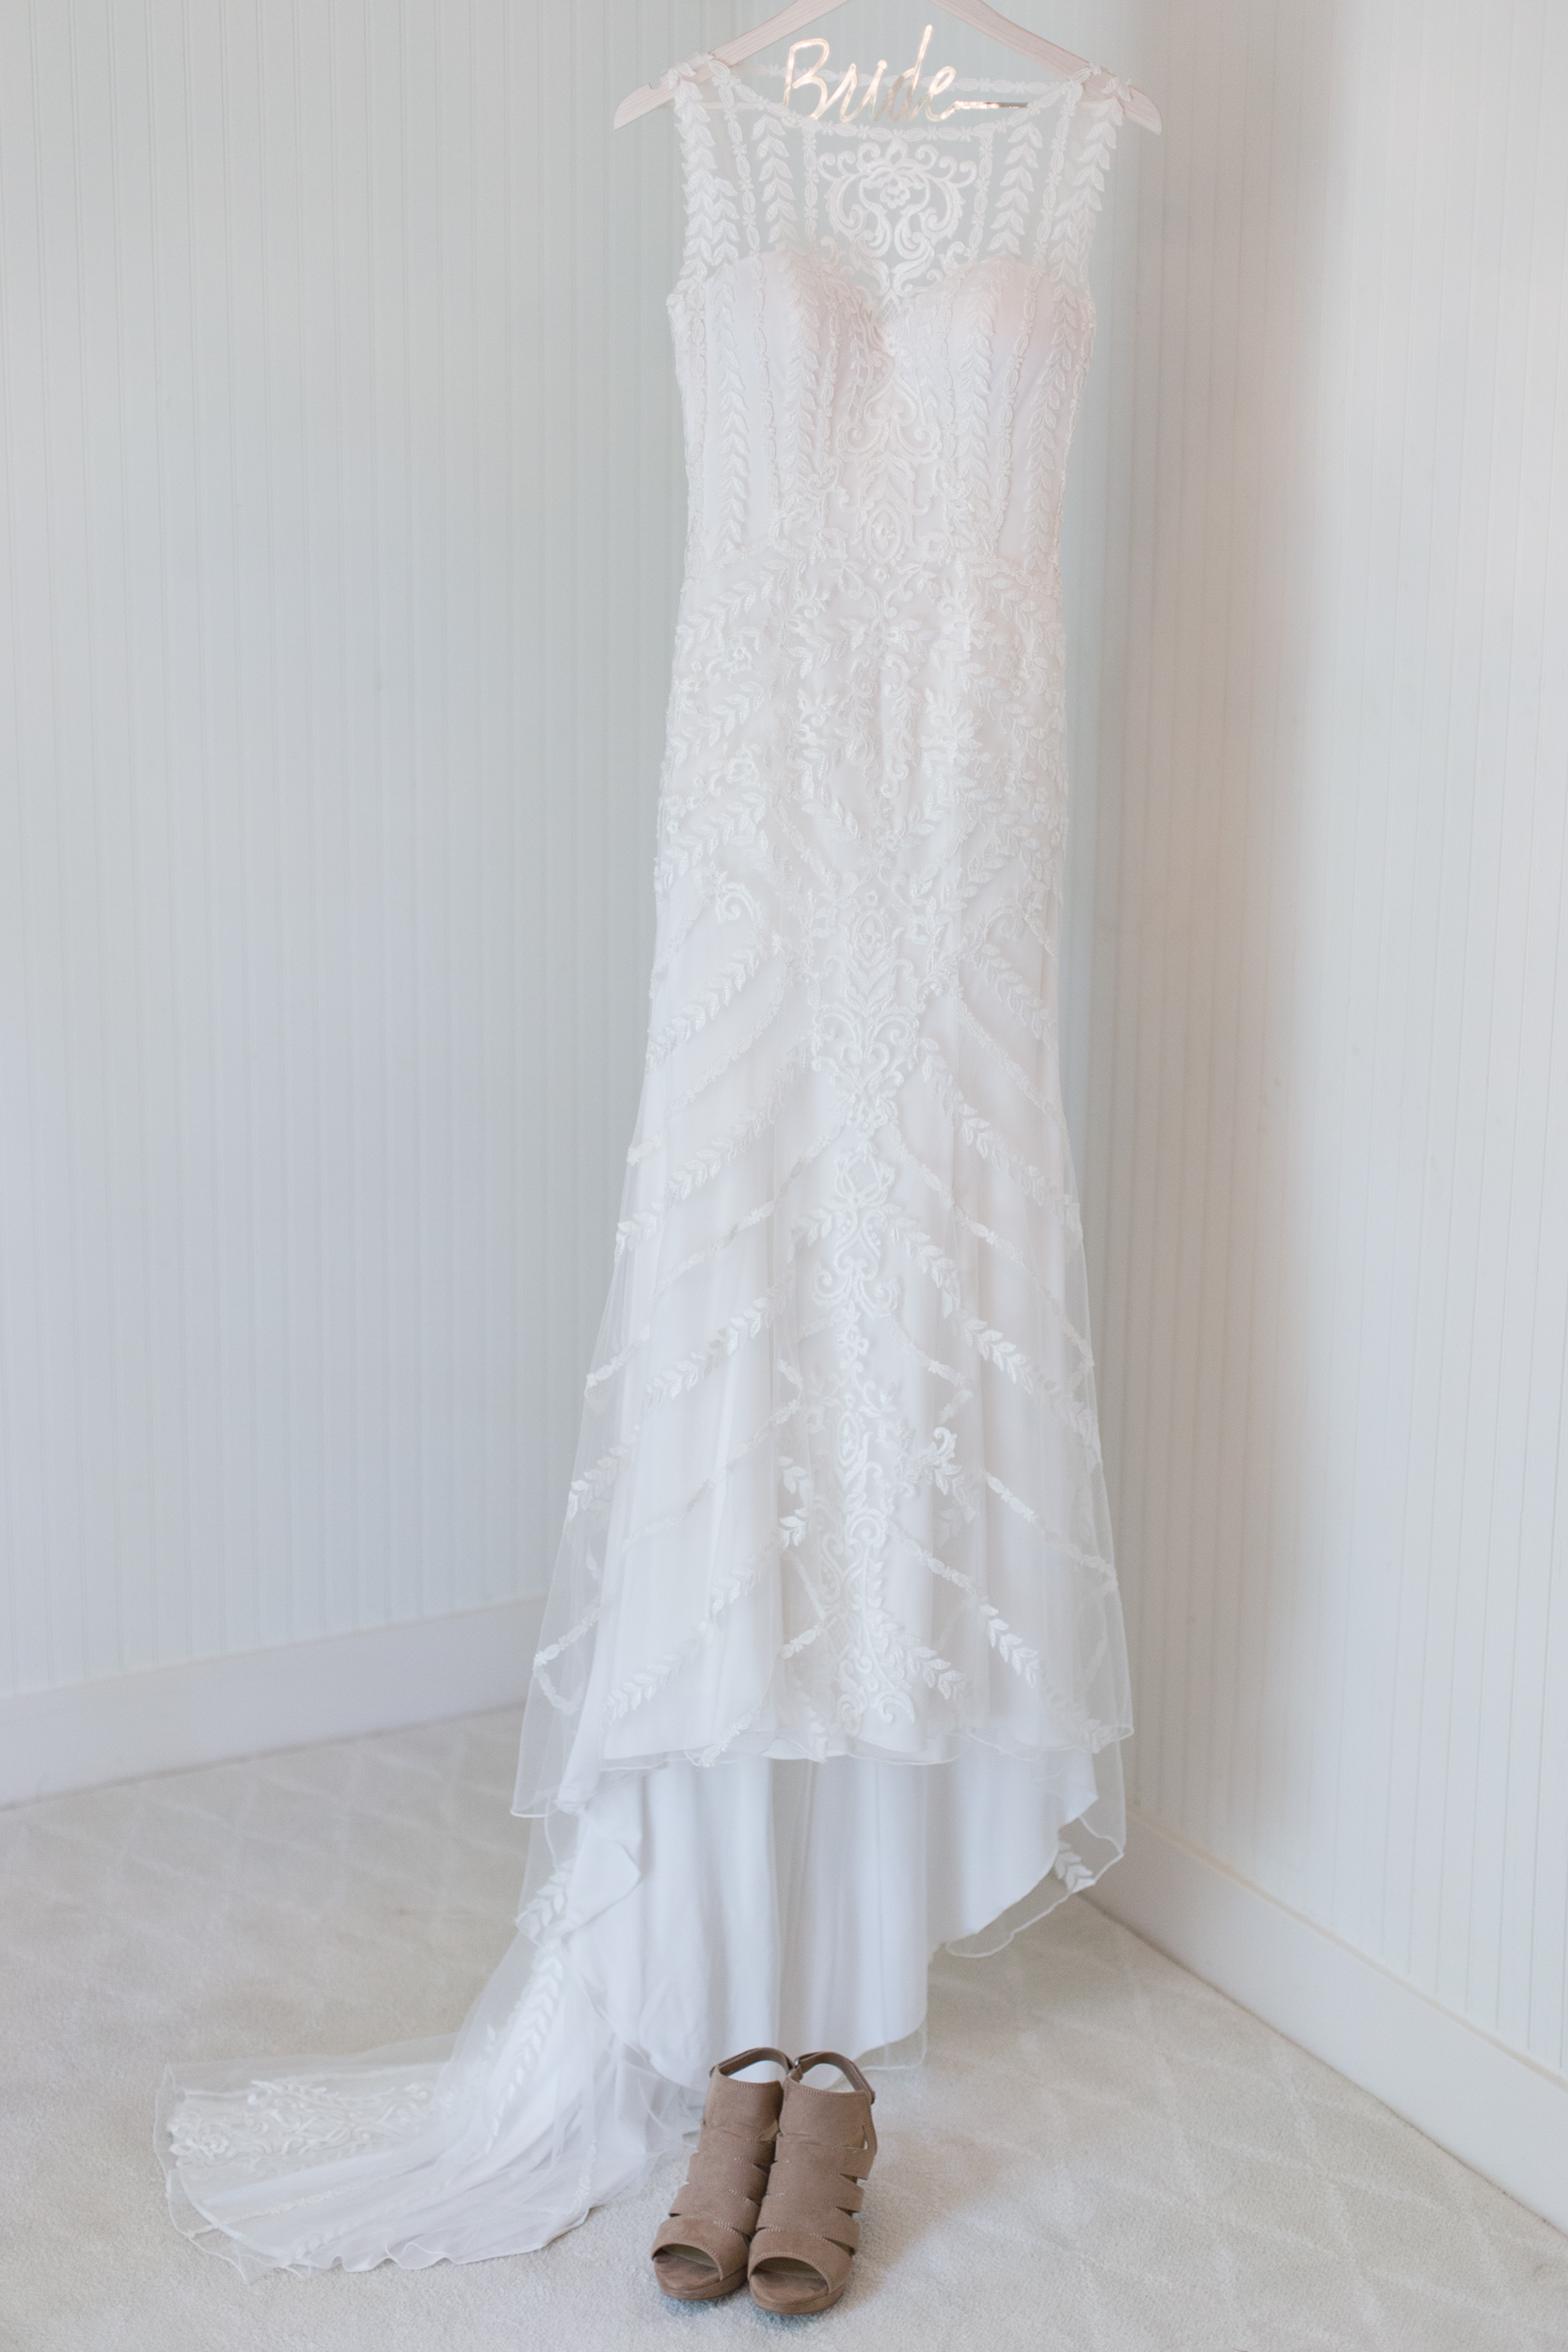 Zihlman-East TX Wedding_Kelsie Hendricks Photography_The Folmar Tyler Texas-52.jpg